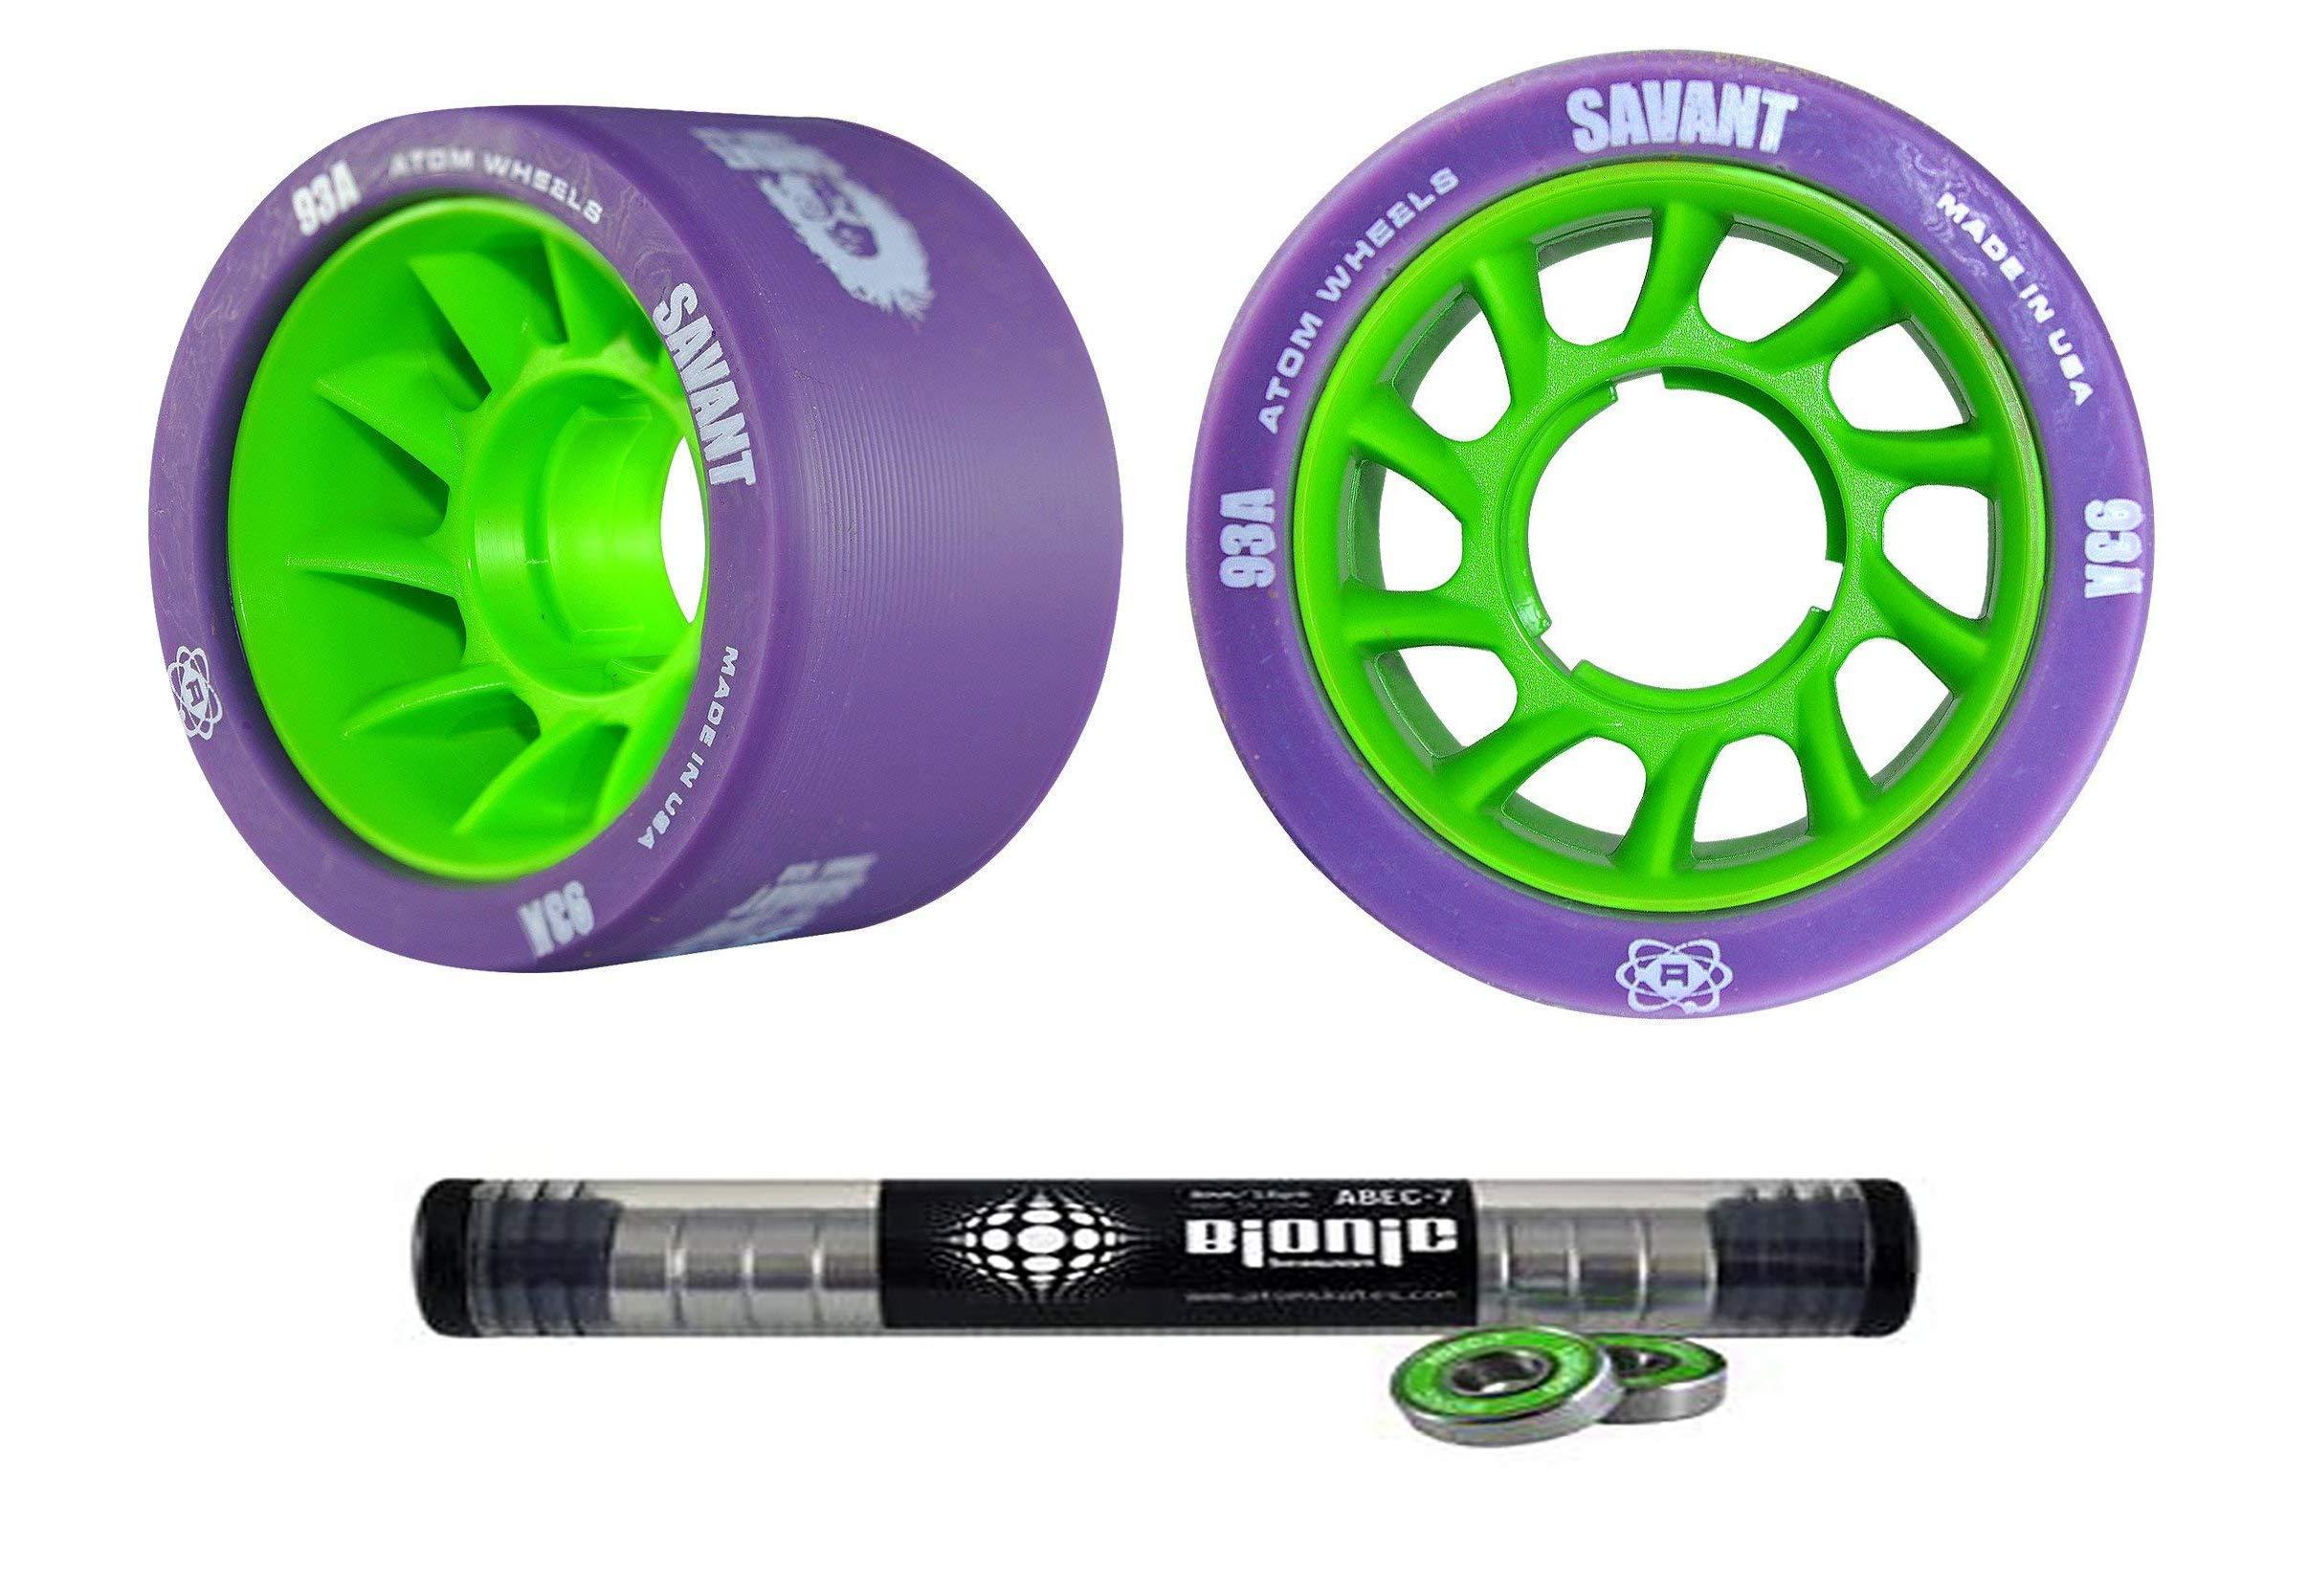 Atom Savant Skate Wheels with Bionic Bearings 8mm Full Set of 8 Purple 93A by Atom Skates